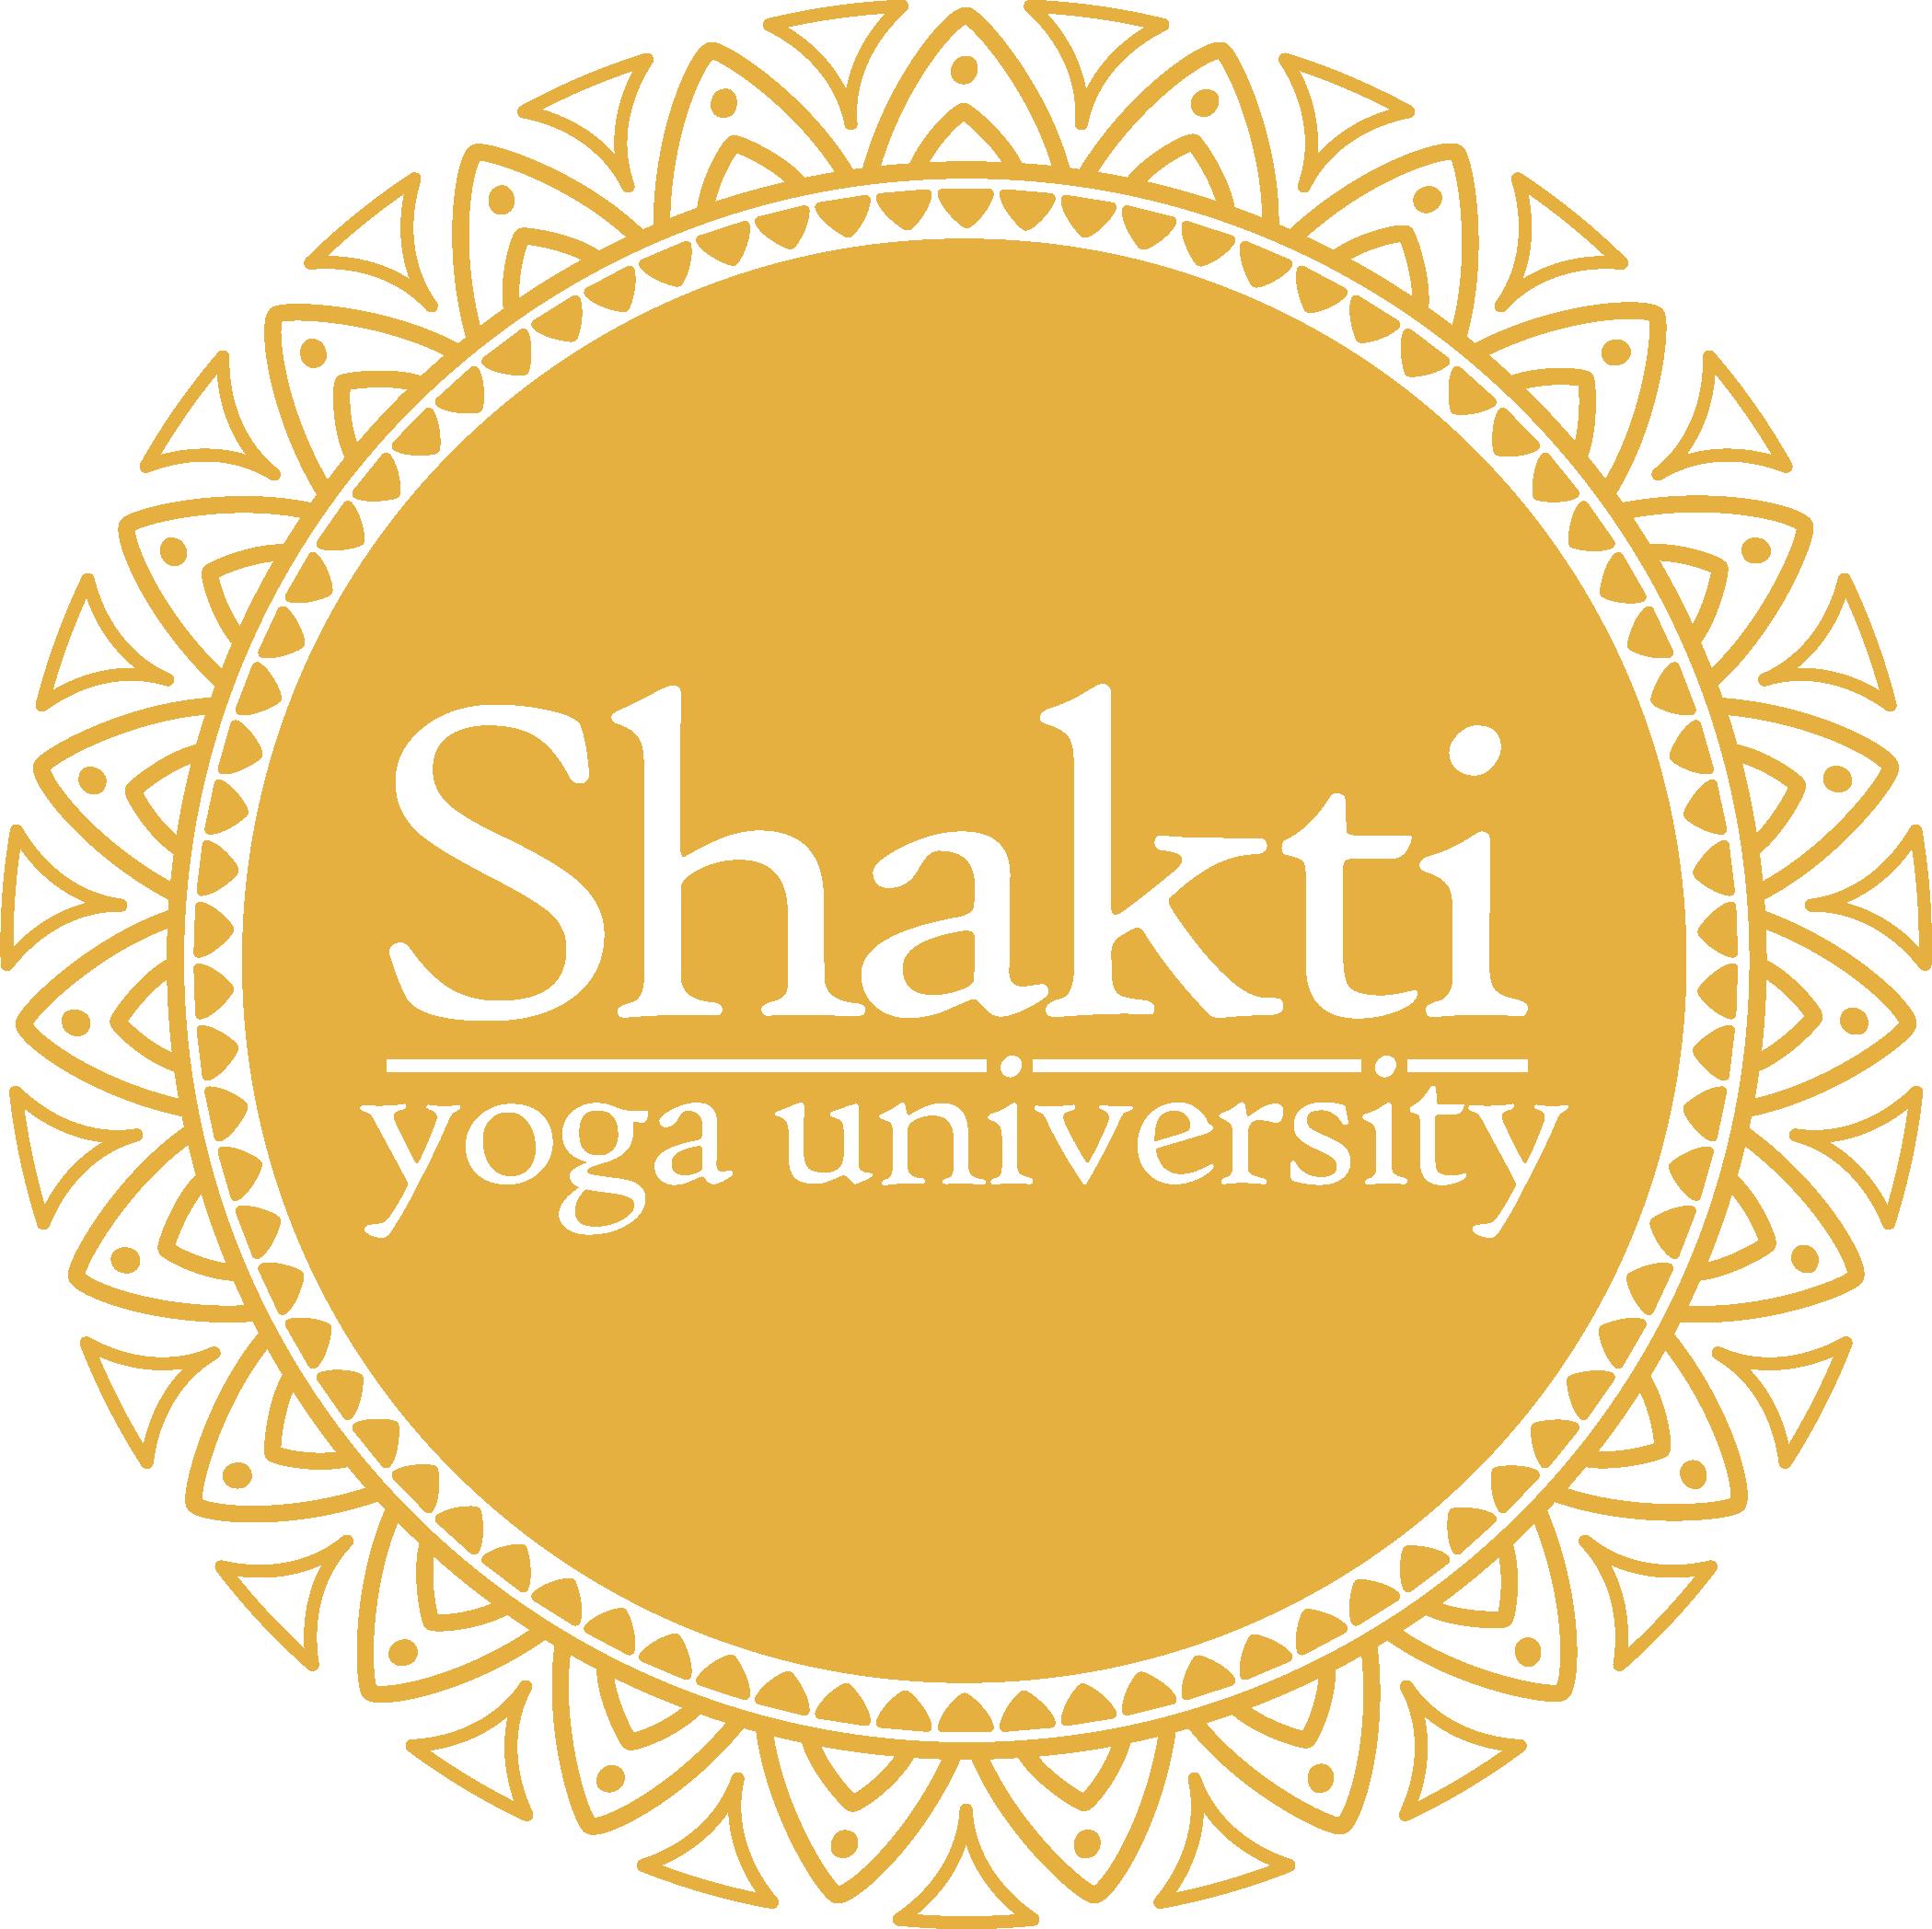 Shakti_yoga_university-gold-fill.pngMAIN.png